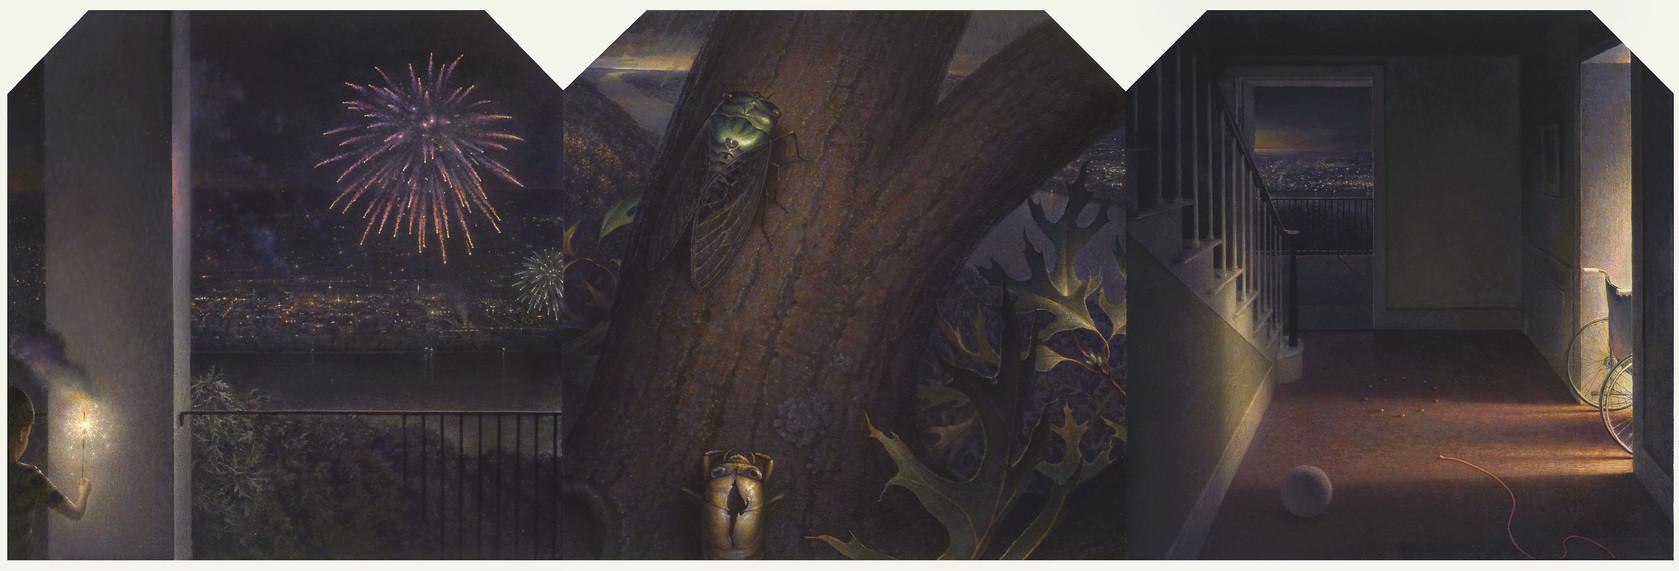 Cicada ultimate 9 9 inch.jpg